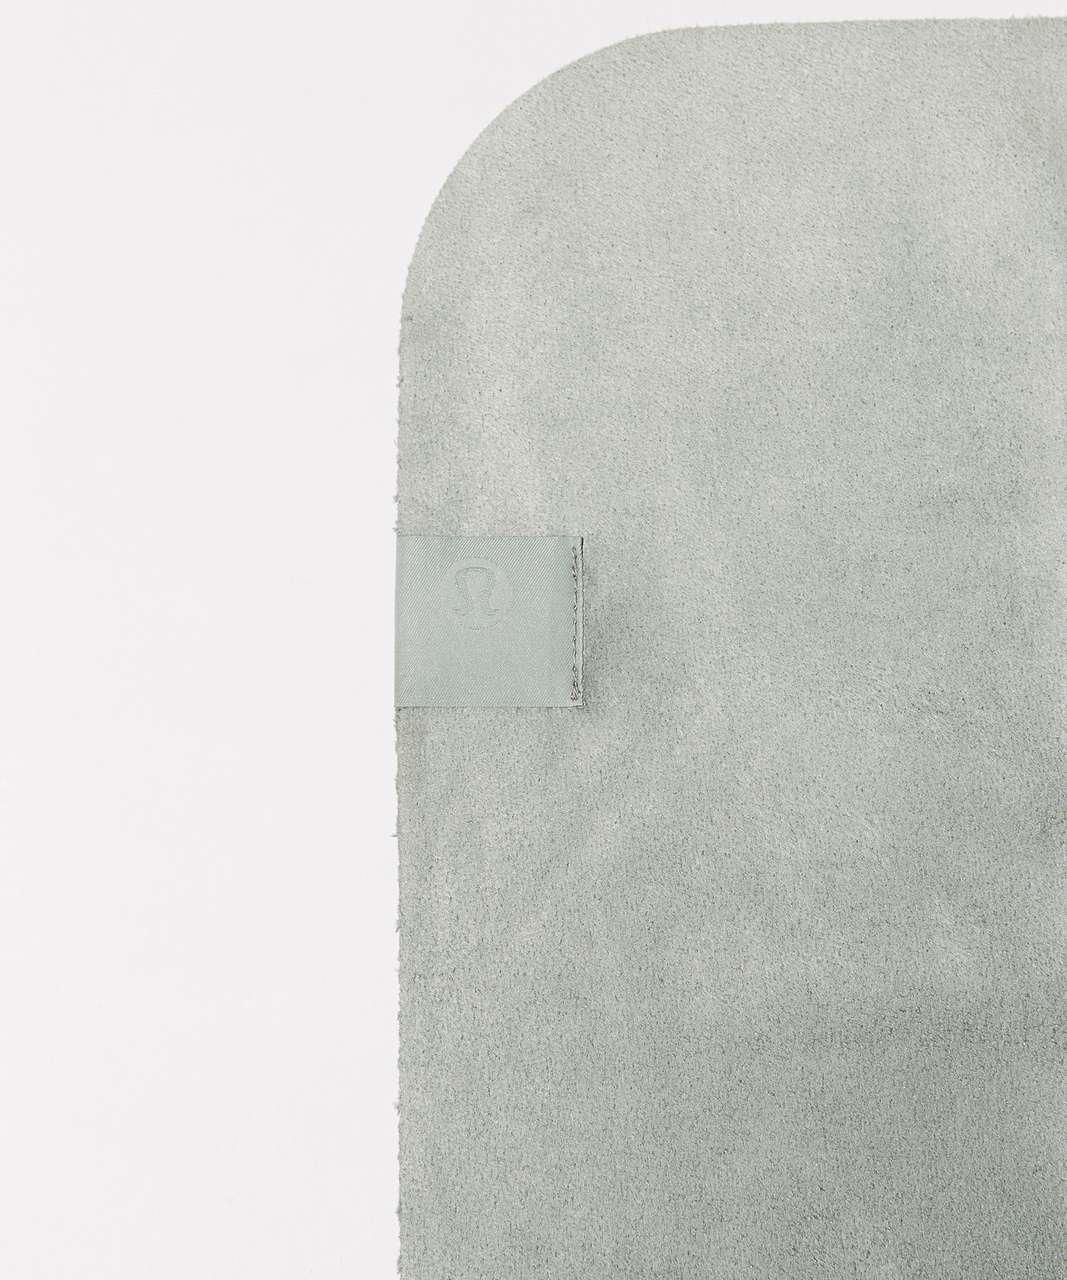 Lululemon The (Small) Towel (Taryn Toomey Collection) - Taryn Toomey Towel Misty Moss Earl Grey